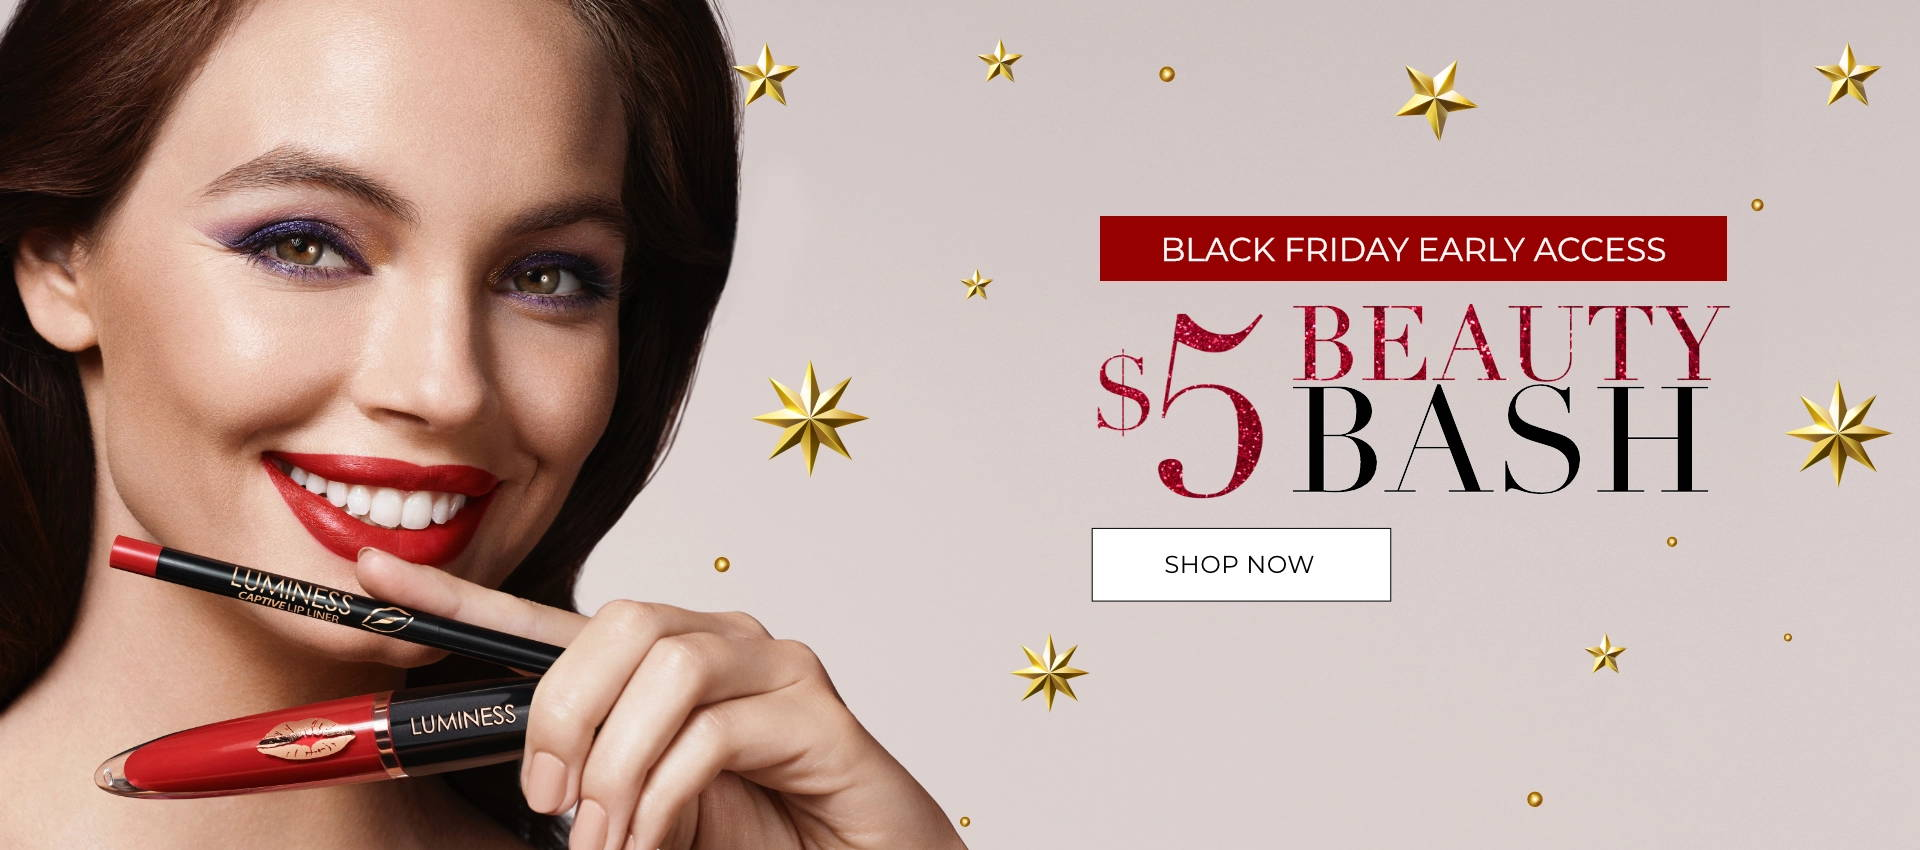 SHOP Black Friday Early Access $5 Beauty Bash